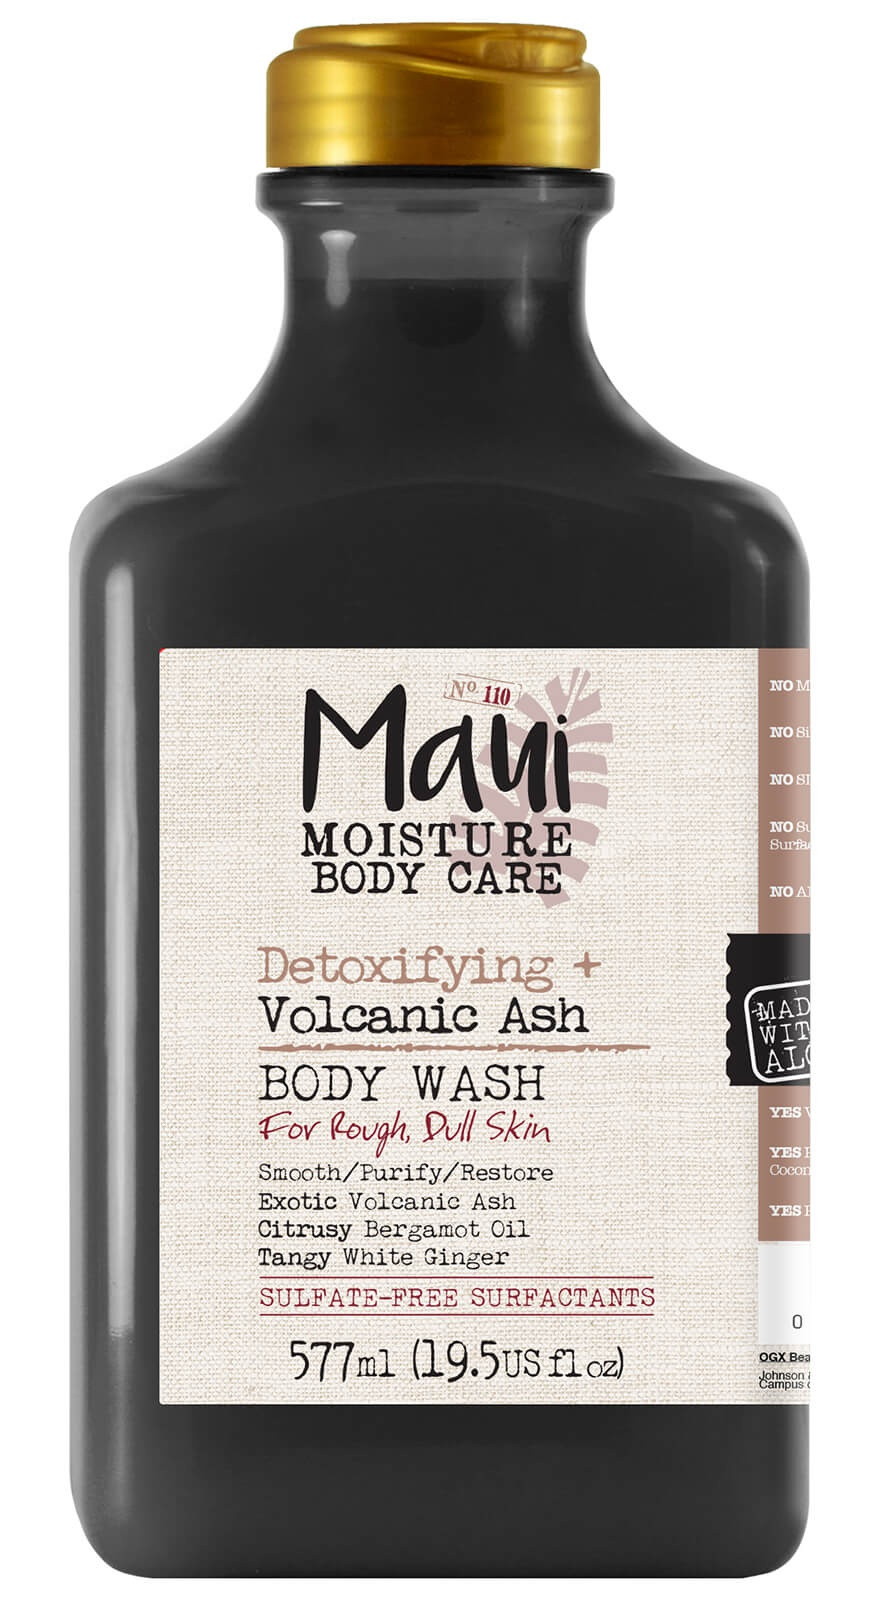 Maui moisture Detoxifying+ Volcanic Ash Body Lotion